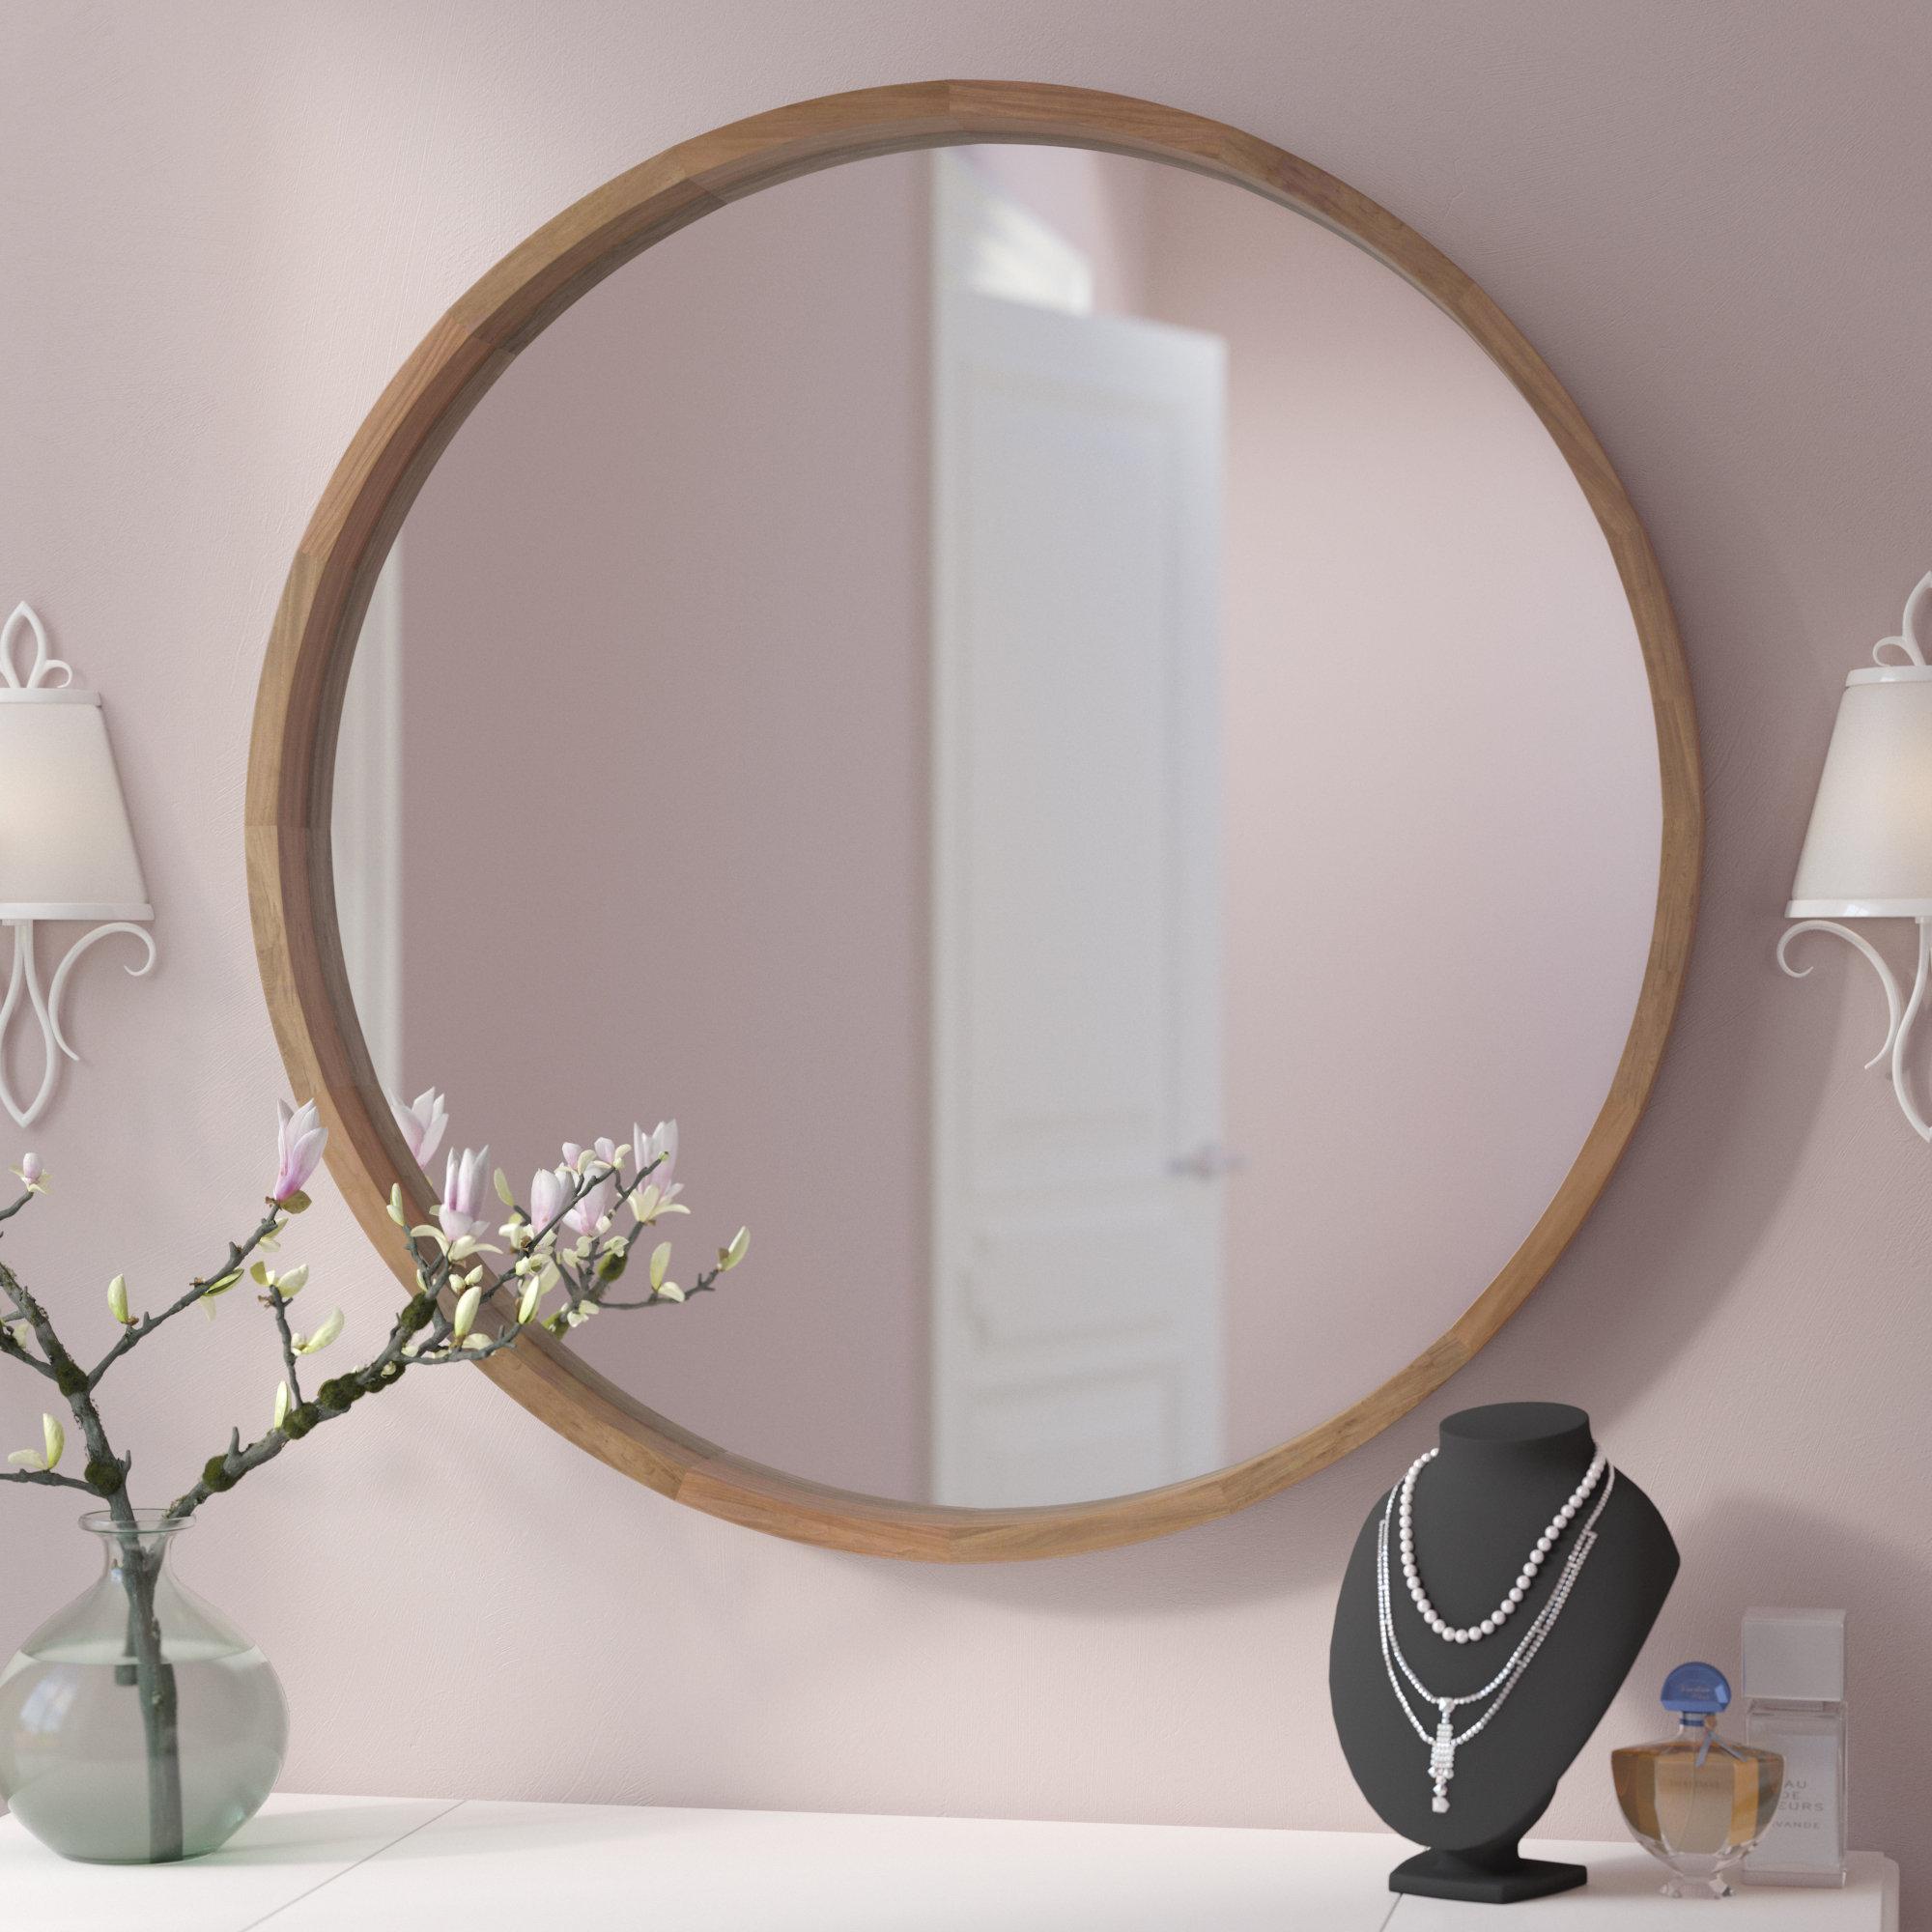 Modern & Contemporary Diamond Wall Mirror | Allmodern In Traditional Frameless Diamond Wall Mirrors (Image 13 of 20)